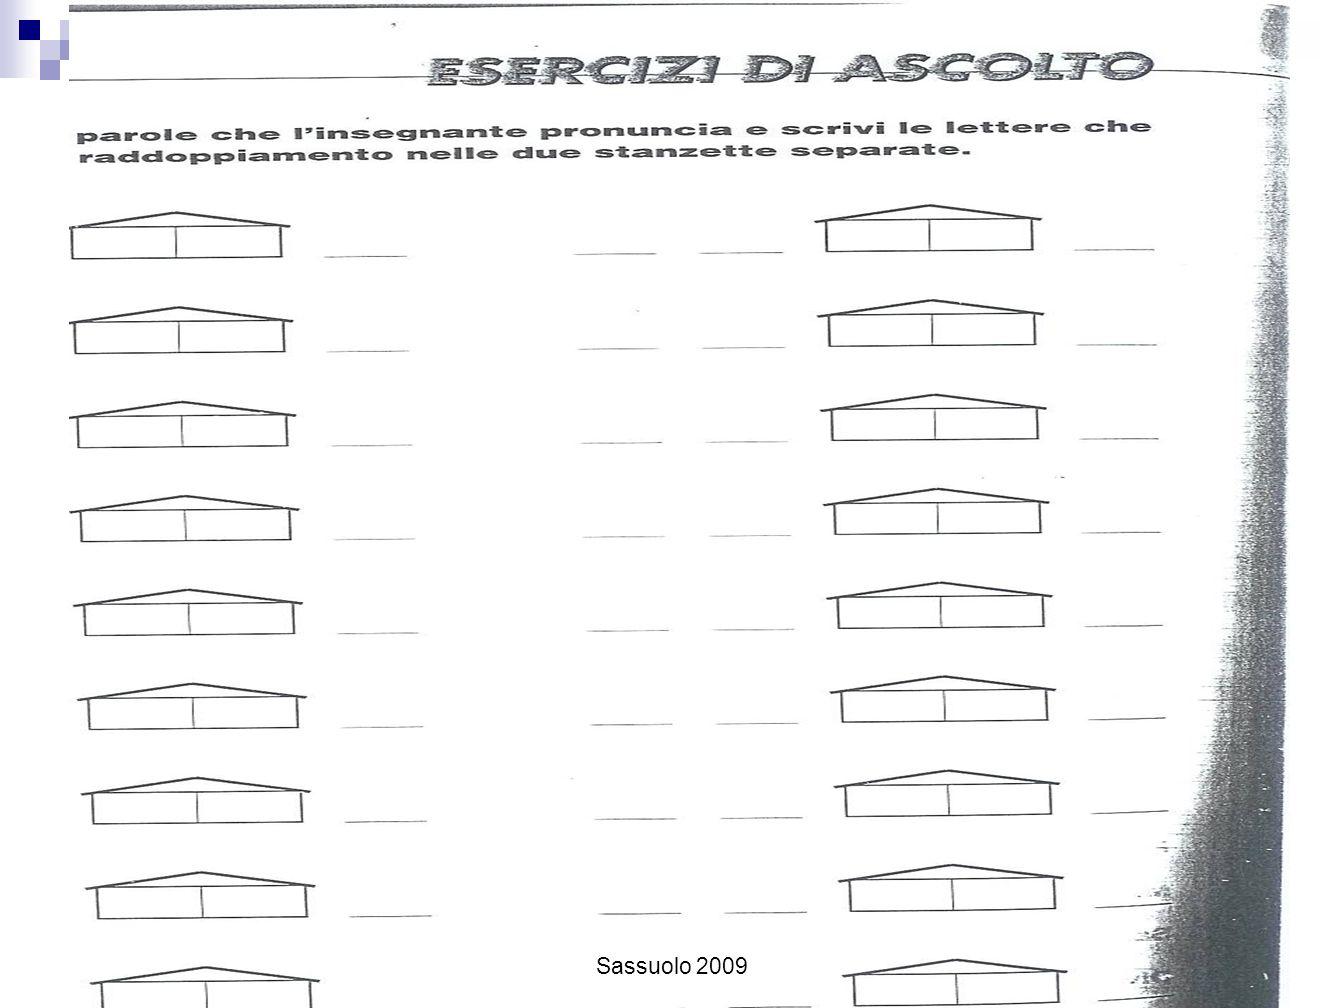 119 Sassuolo 2009